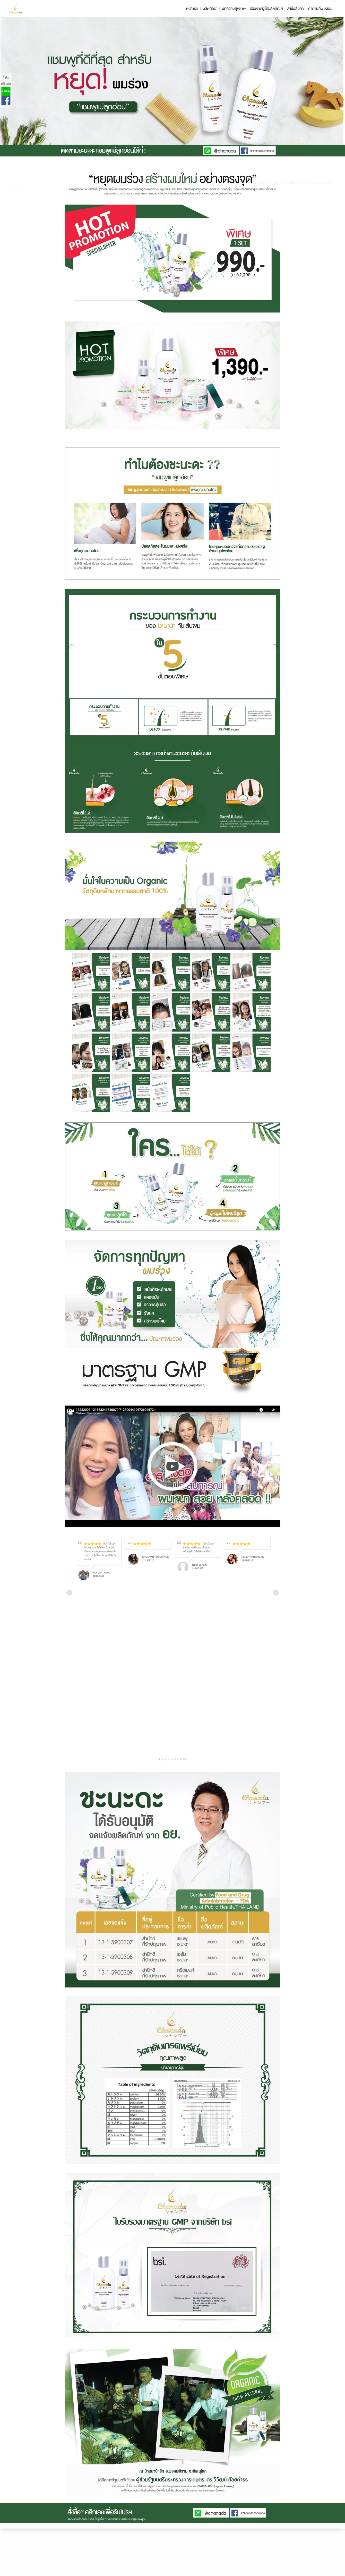 chanadathailand.com